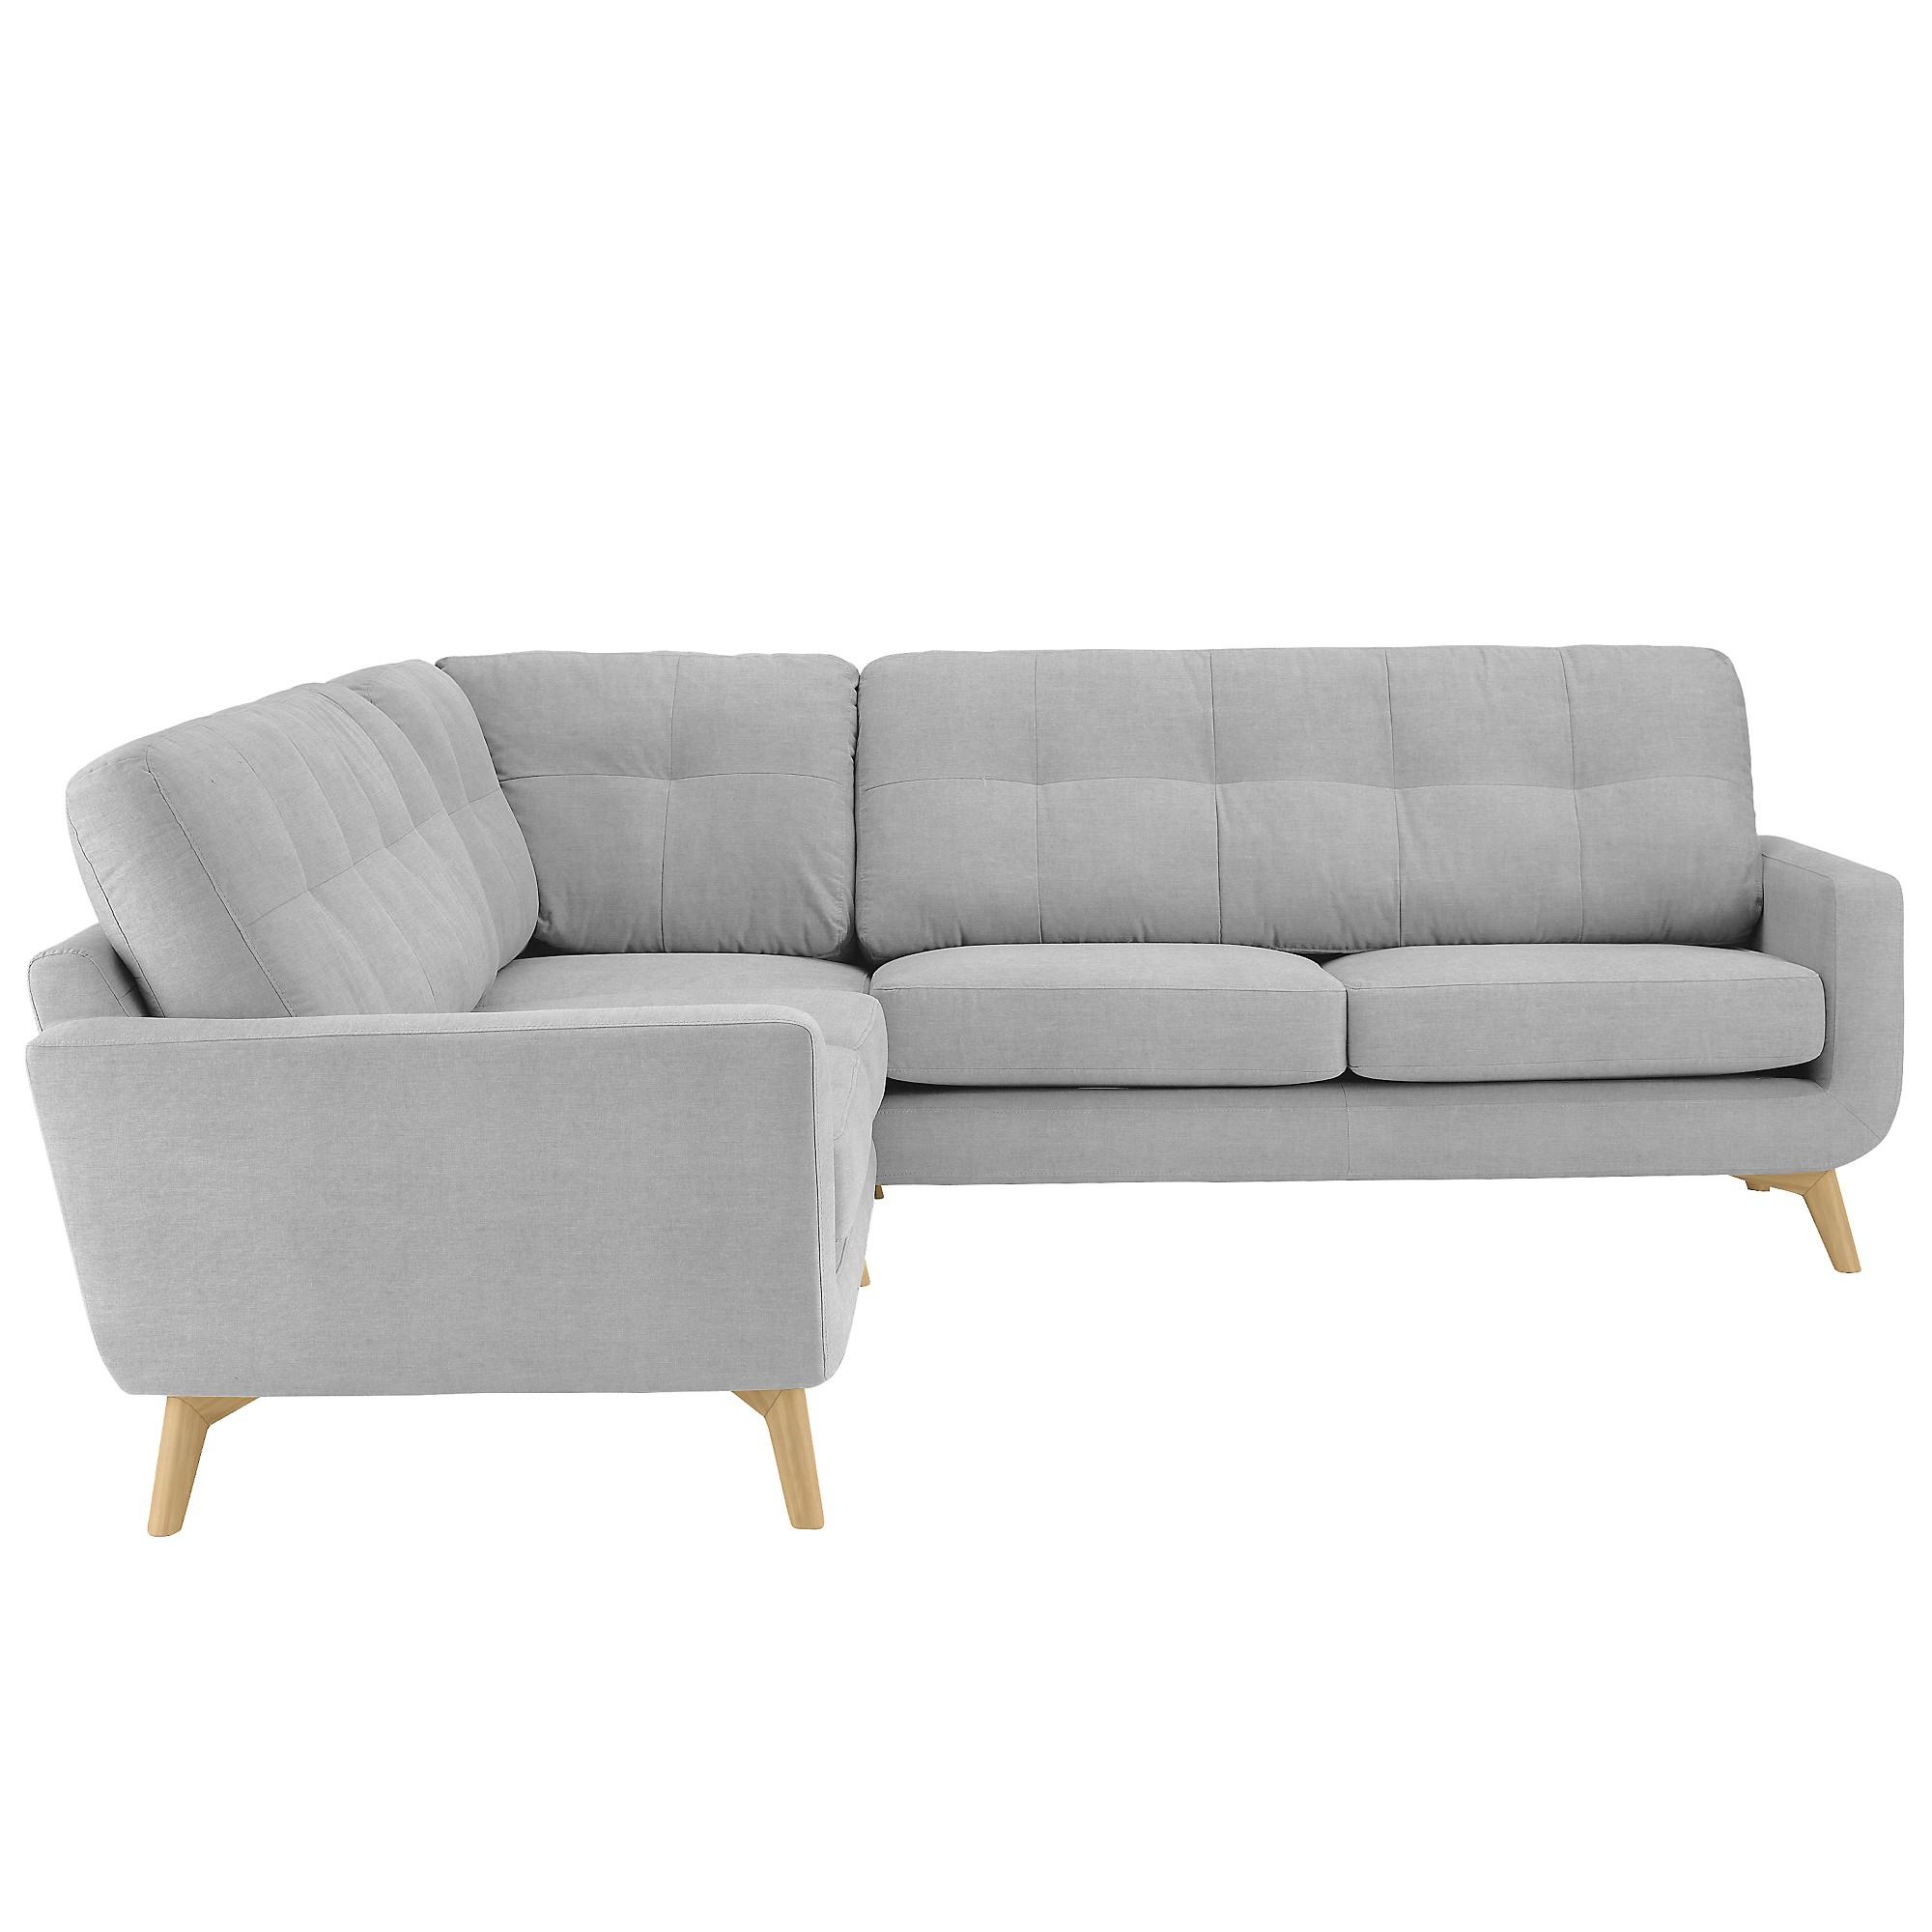 corner sofa reviews uk ebay leather cleaner john lewis barbican review best buy